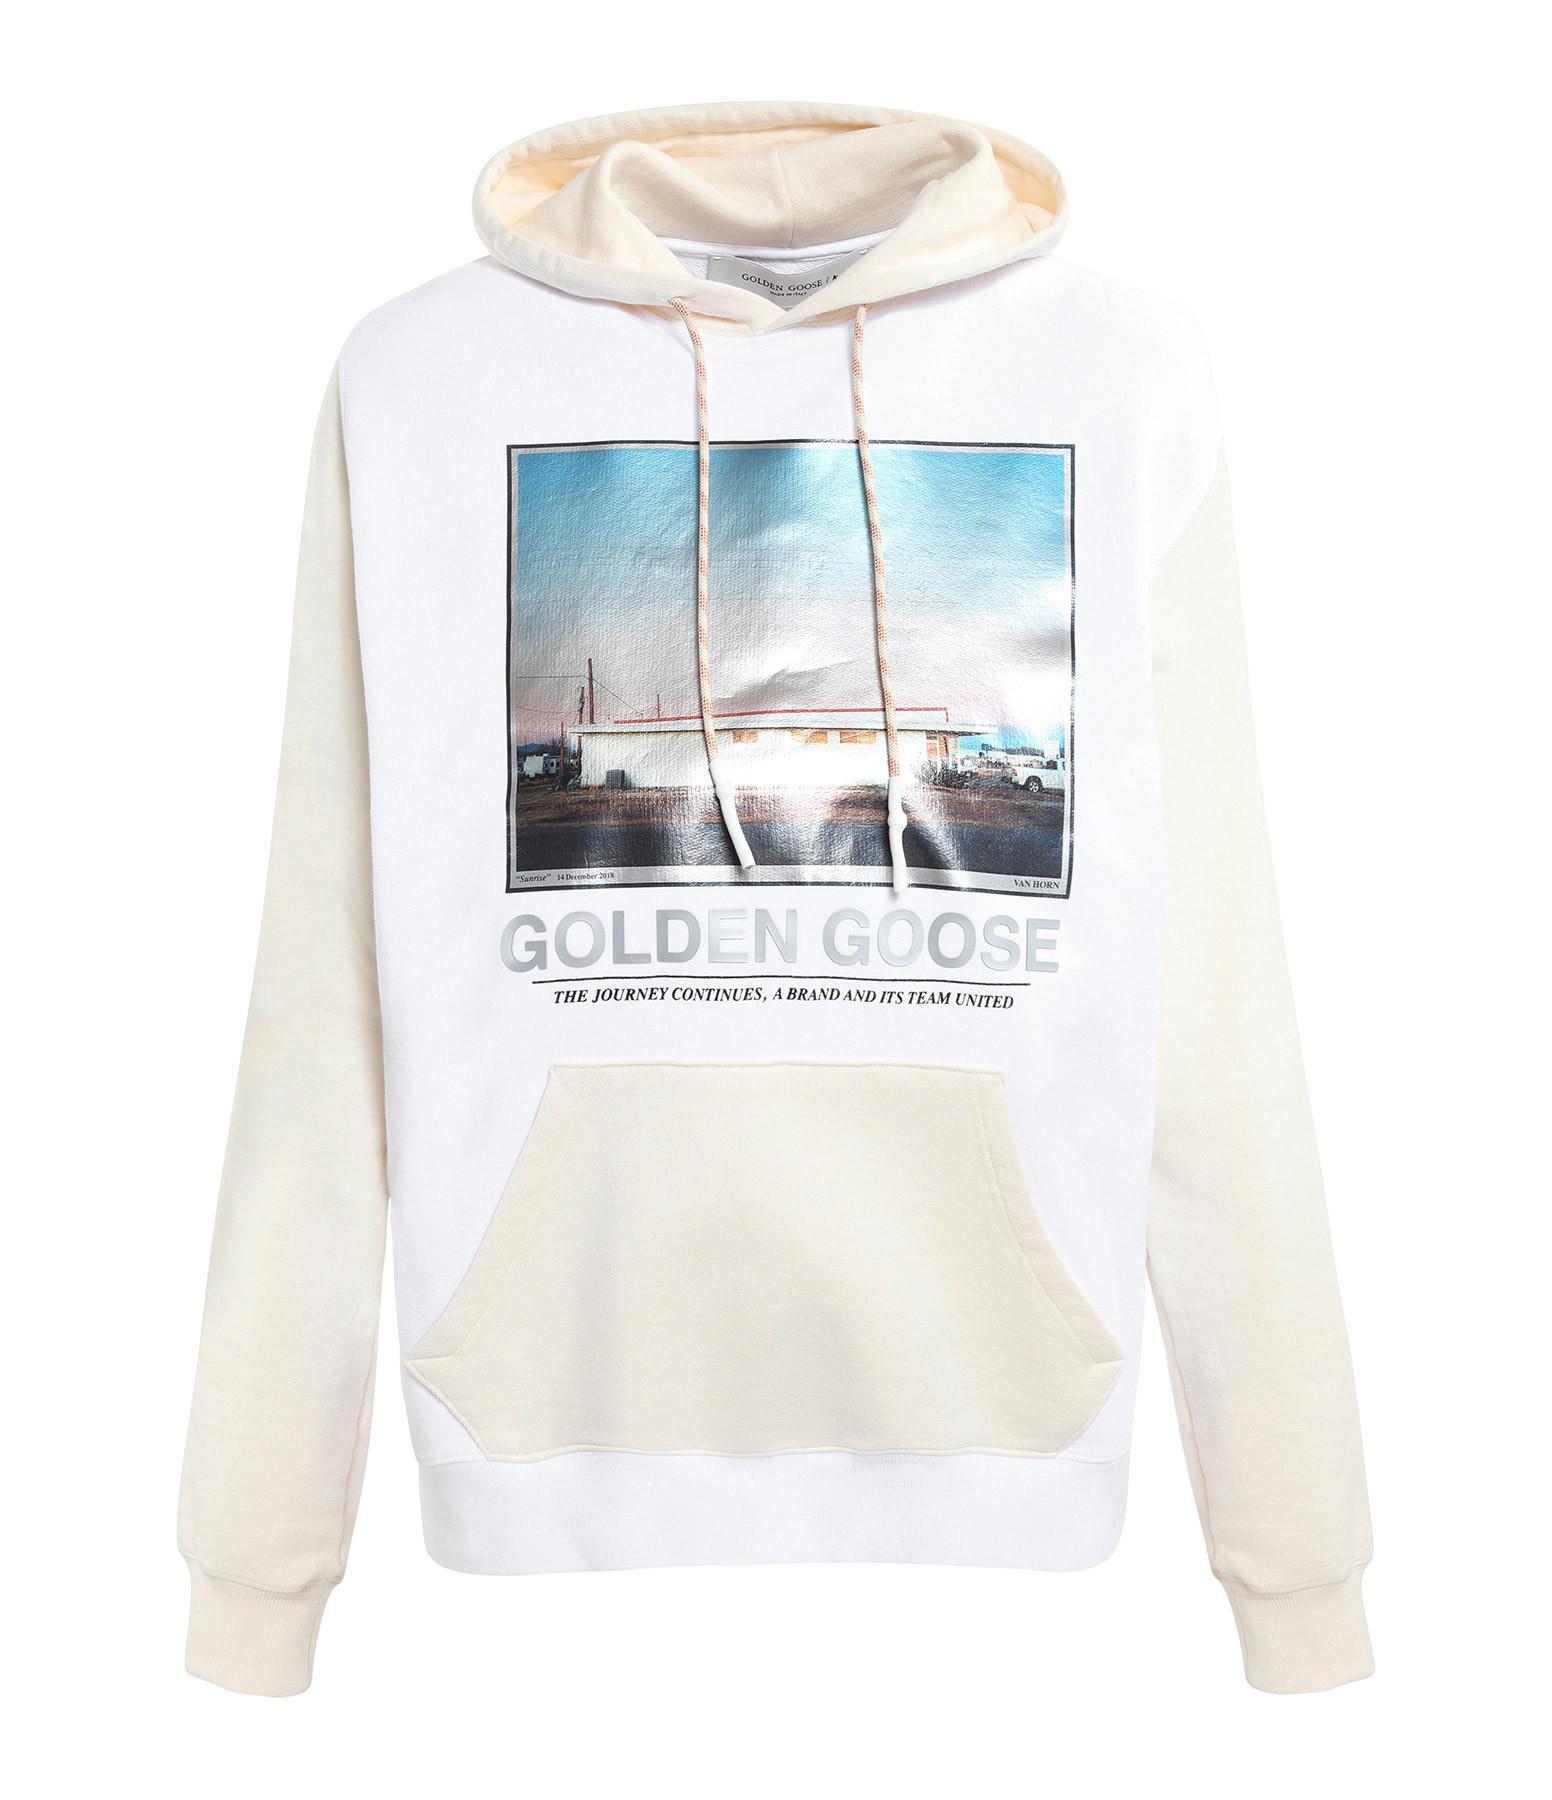 GOLDEN GOOSE - Sweatshirt Homme Nicholas Coton Blanc